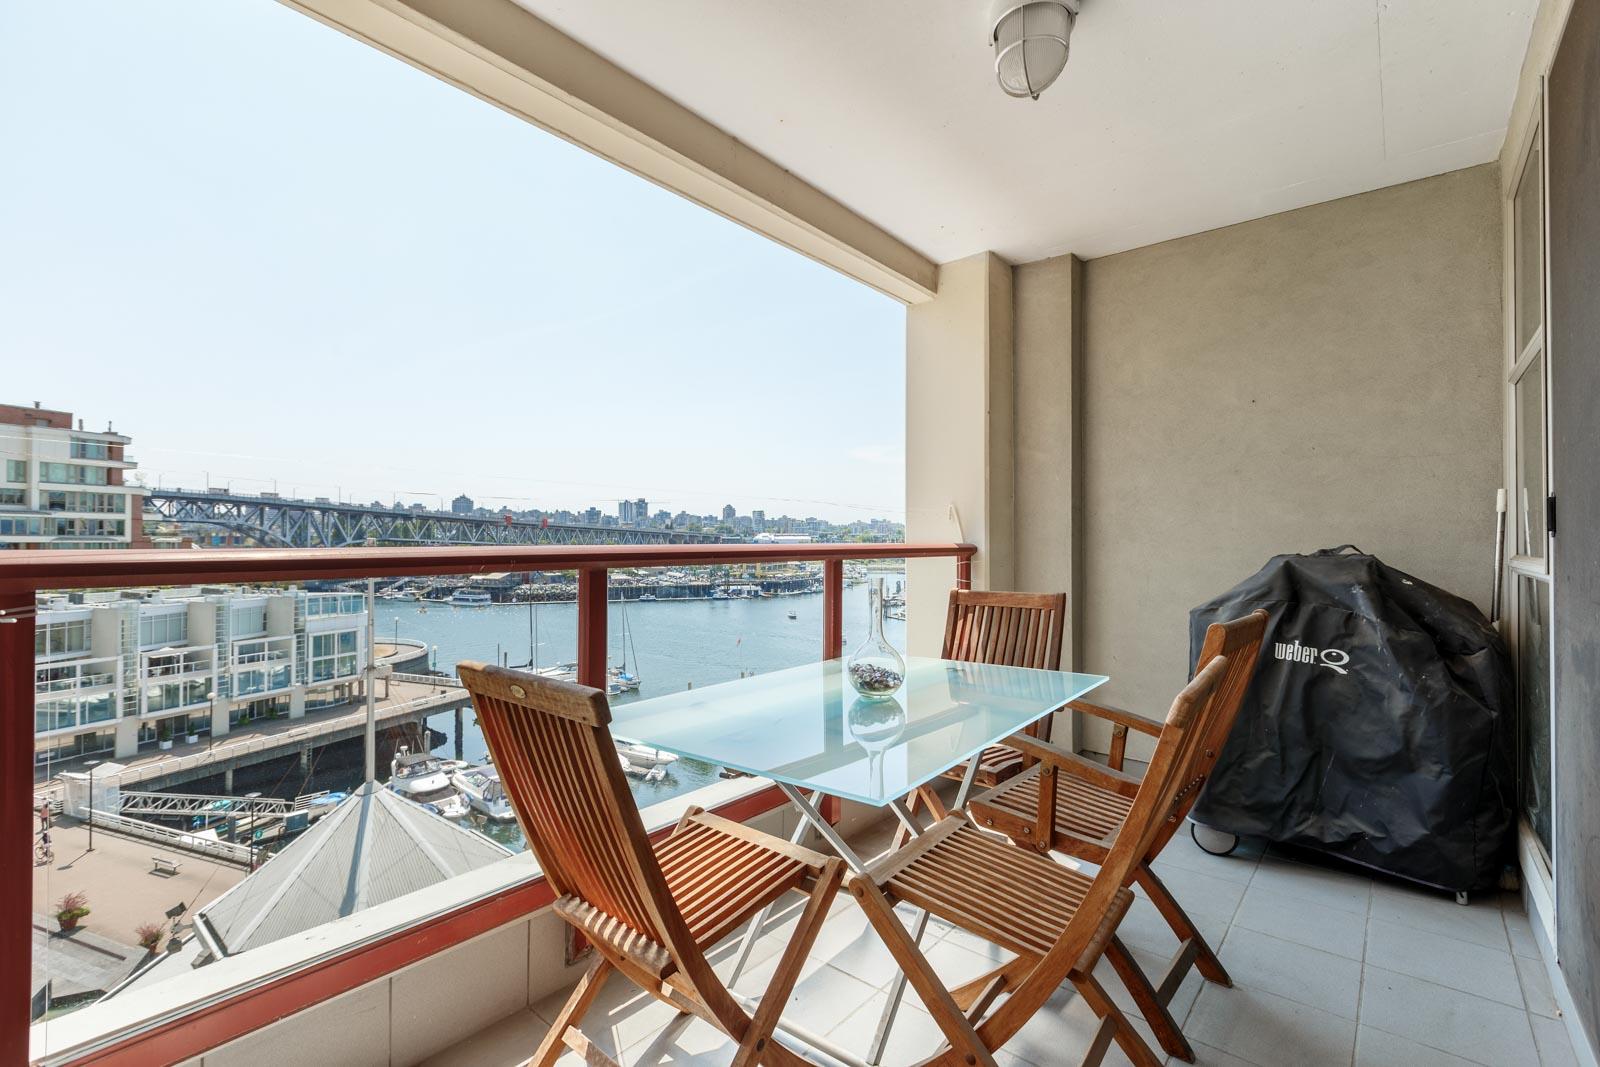 outdoor balcony that overlook the granville marina